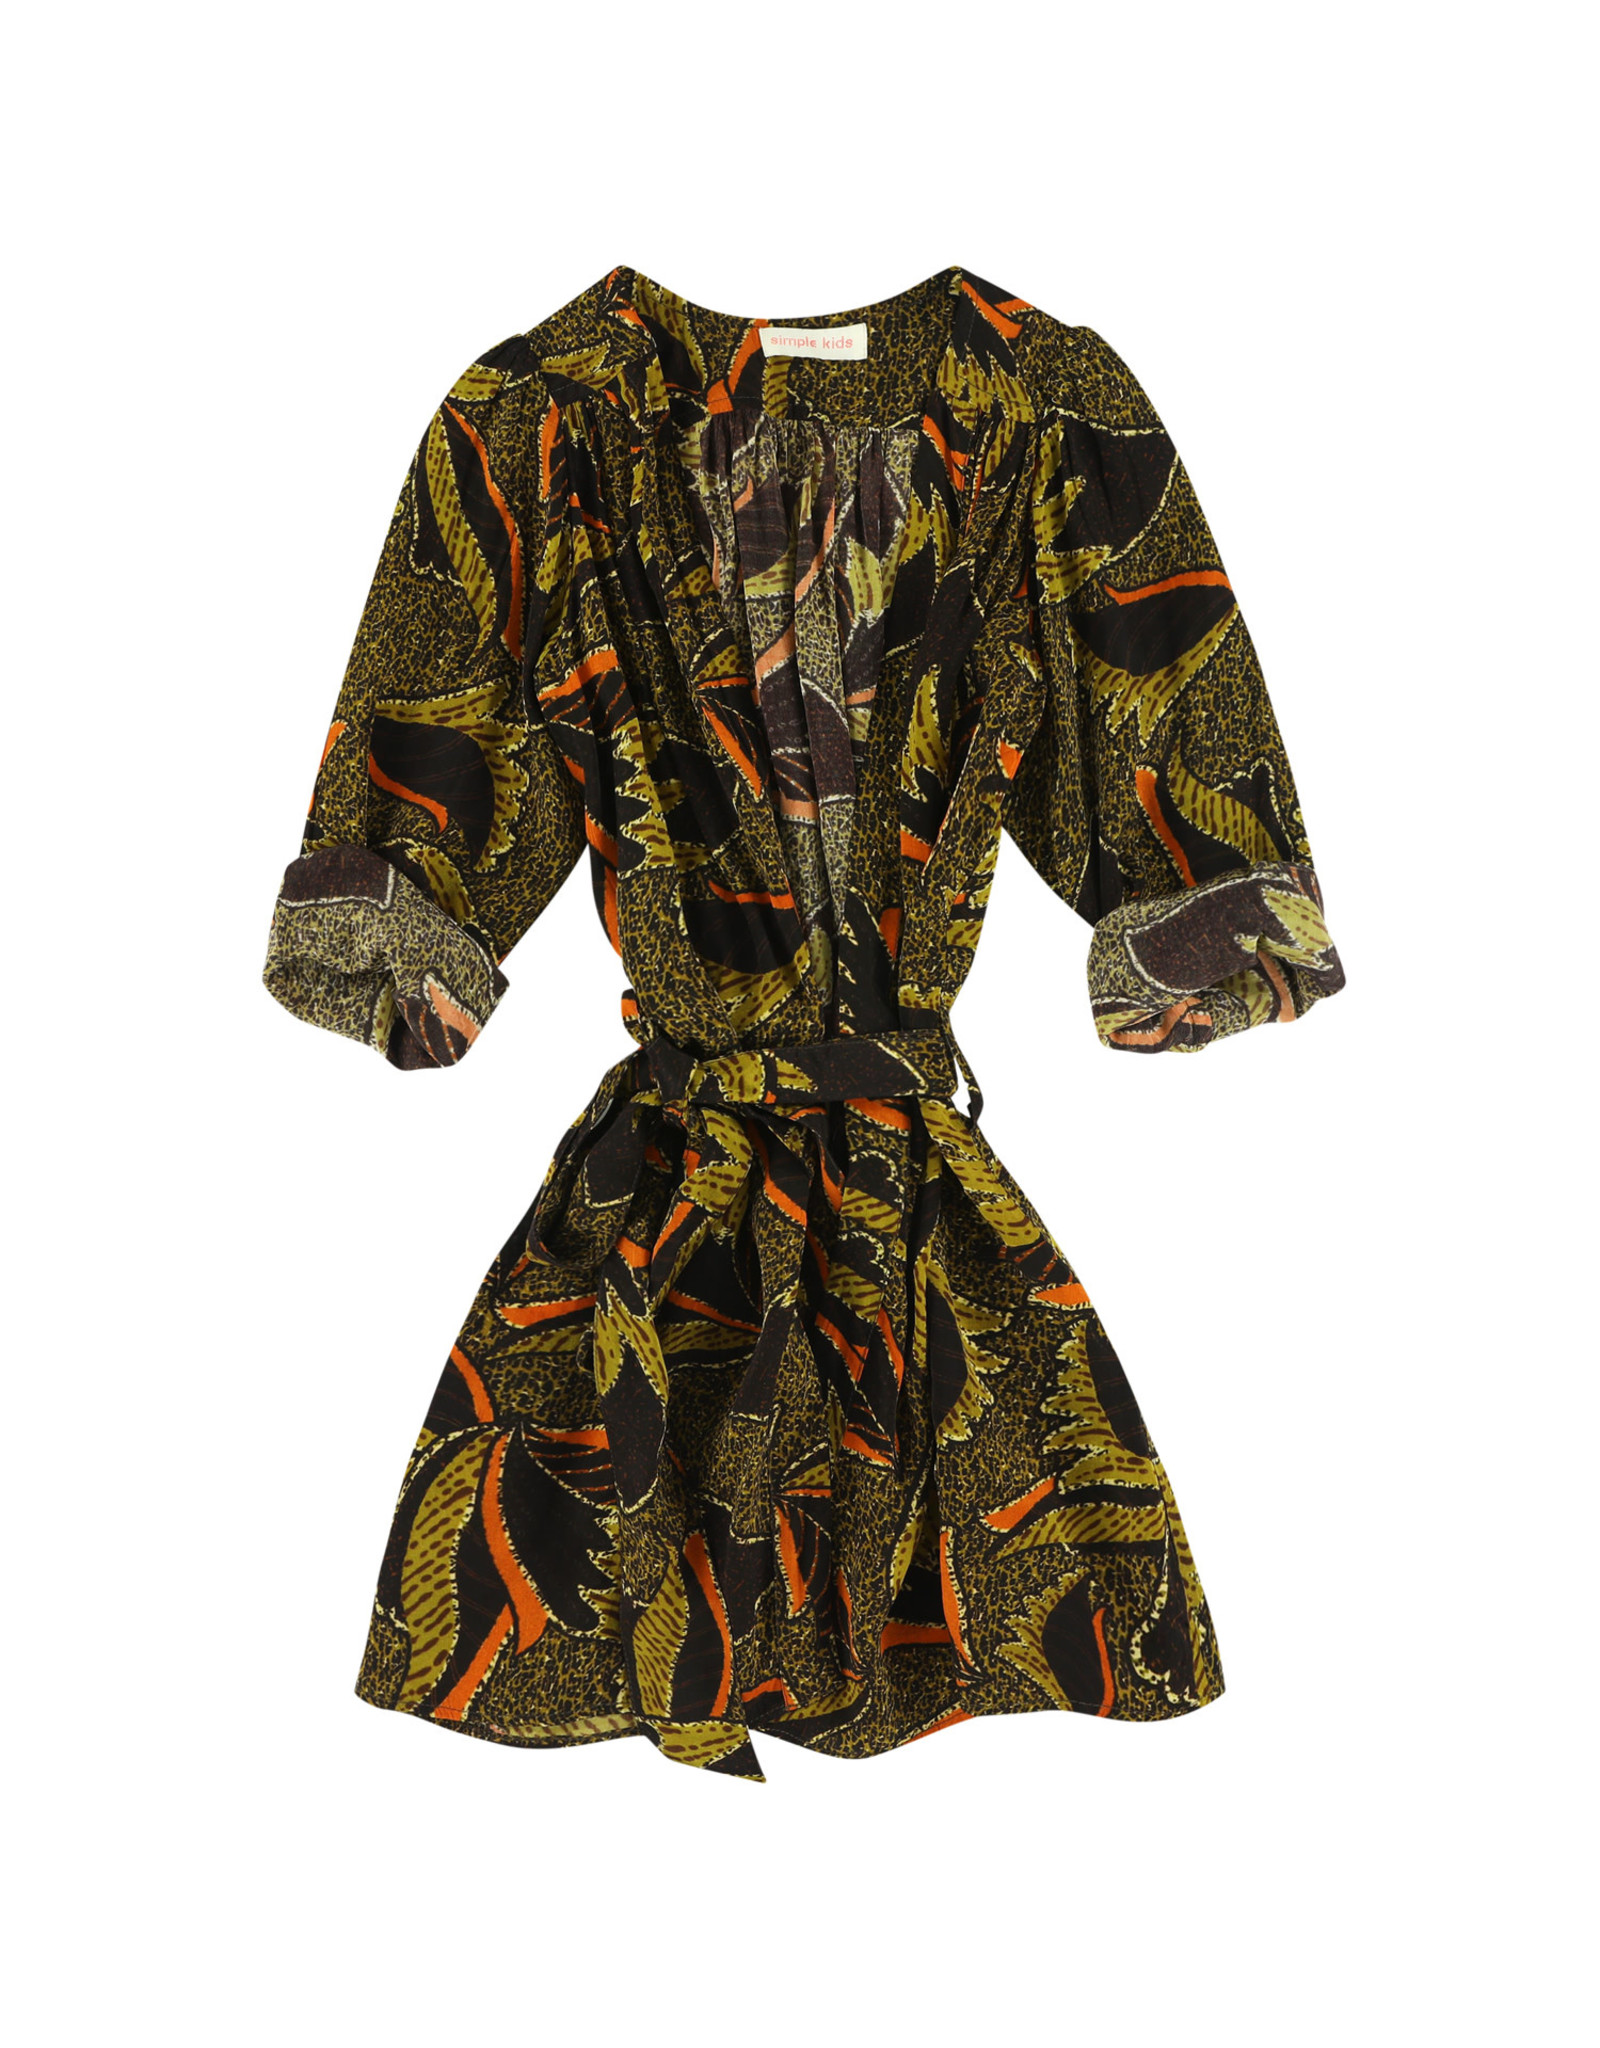 Simple Kids SS21 Lamb tropical tan dress